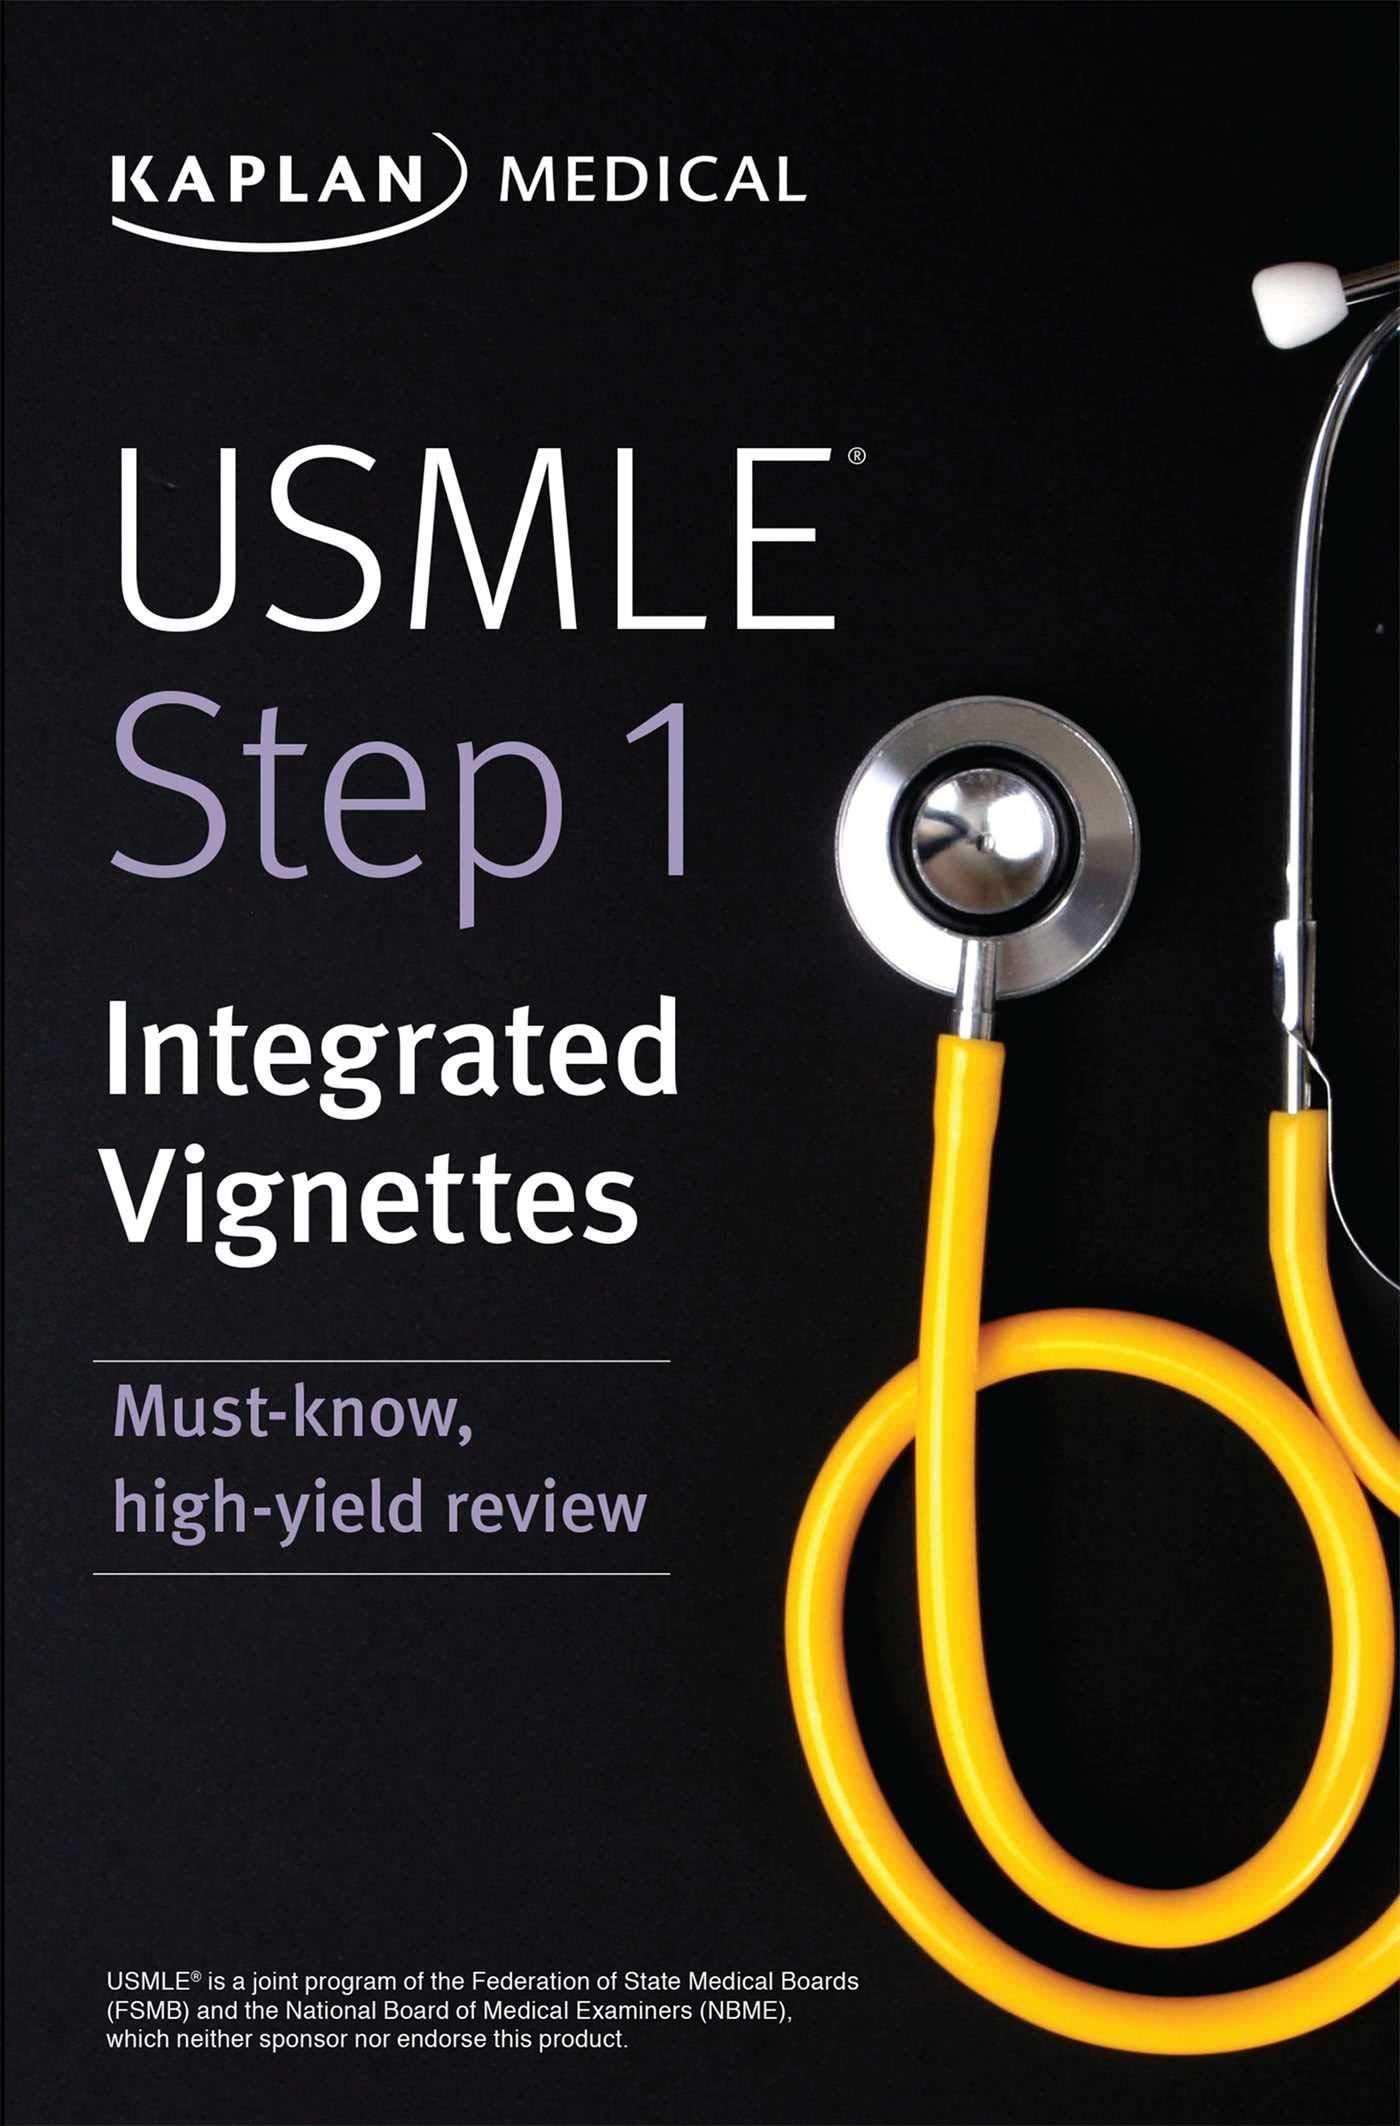 Step 1: USMLE Step 1 Books - Best Books For USMLE